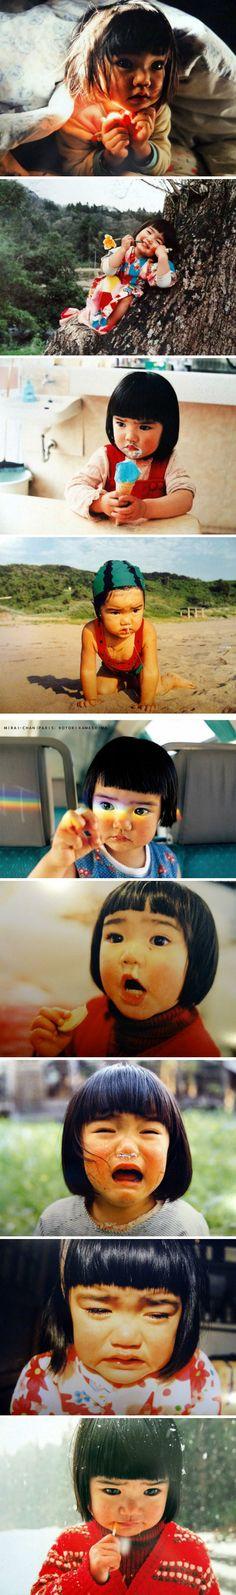 Japanese child. By 川岛小鸟的《未来ちゃん》